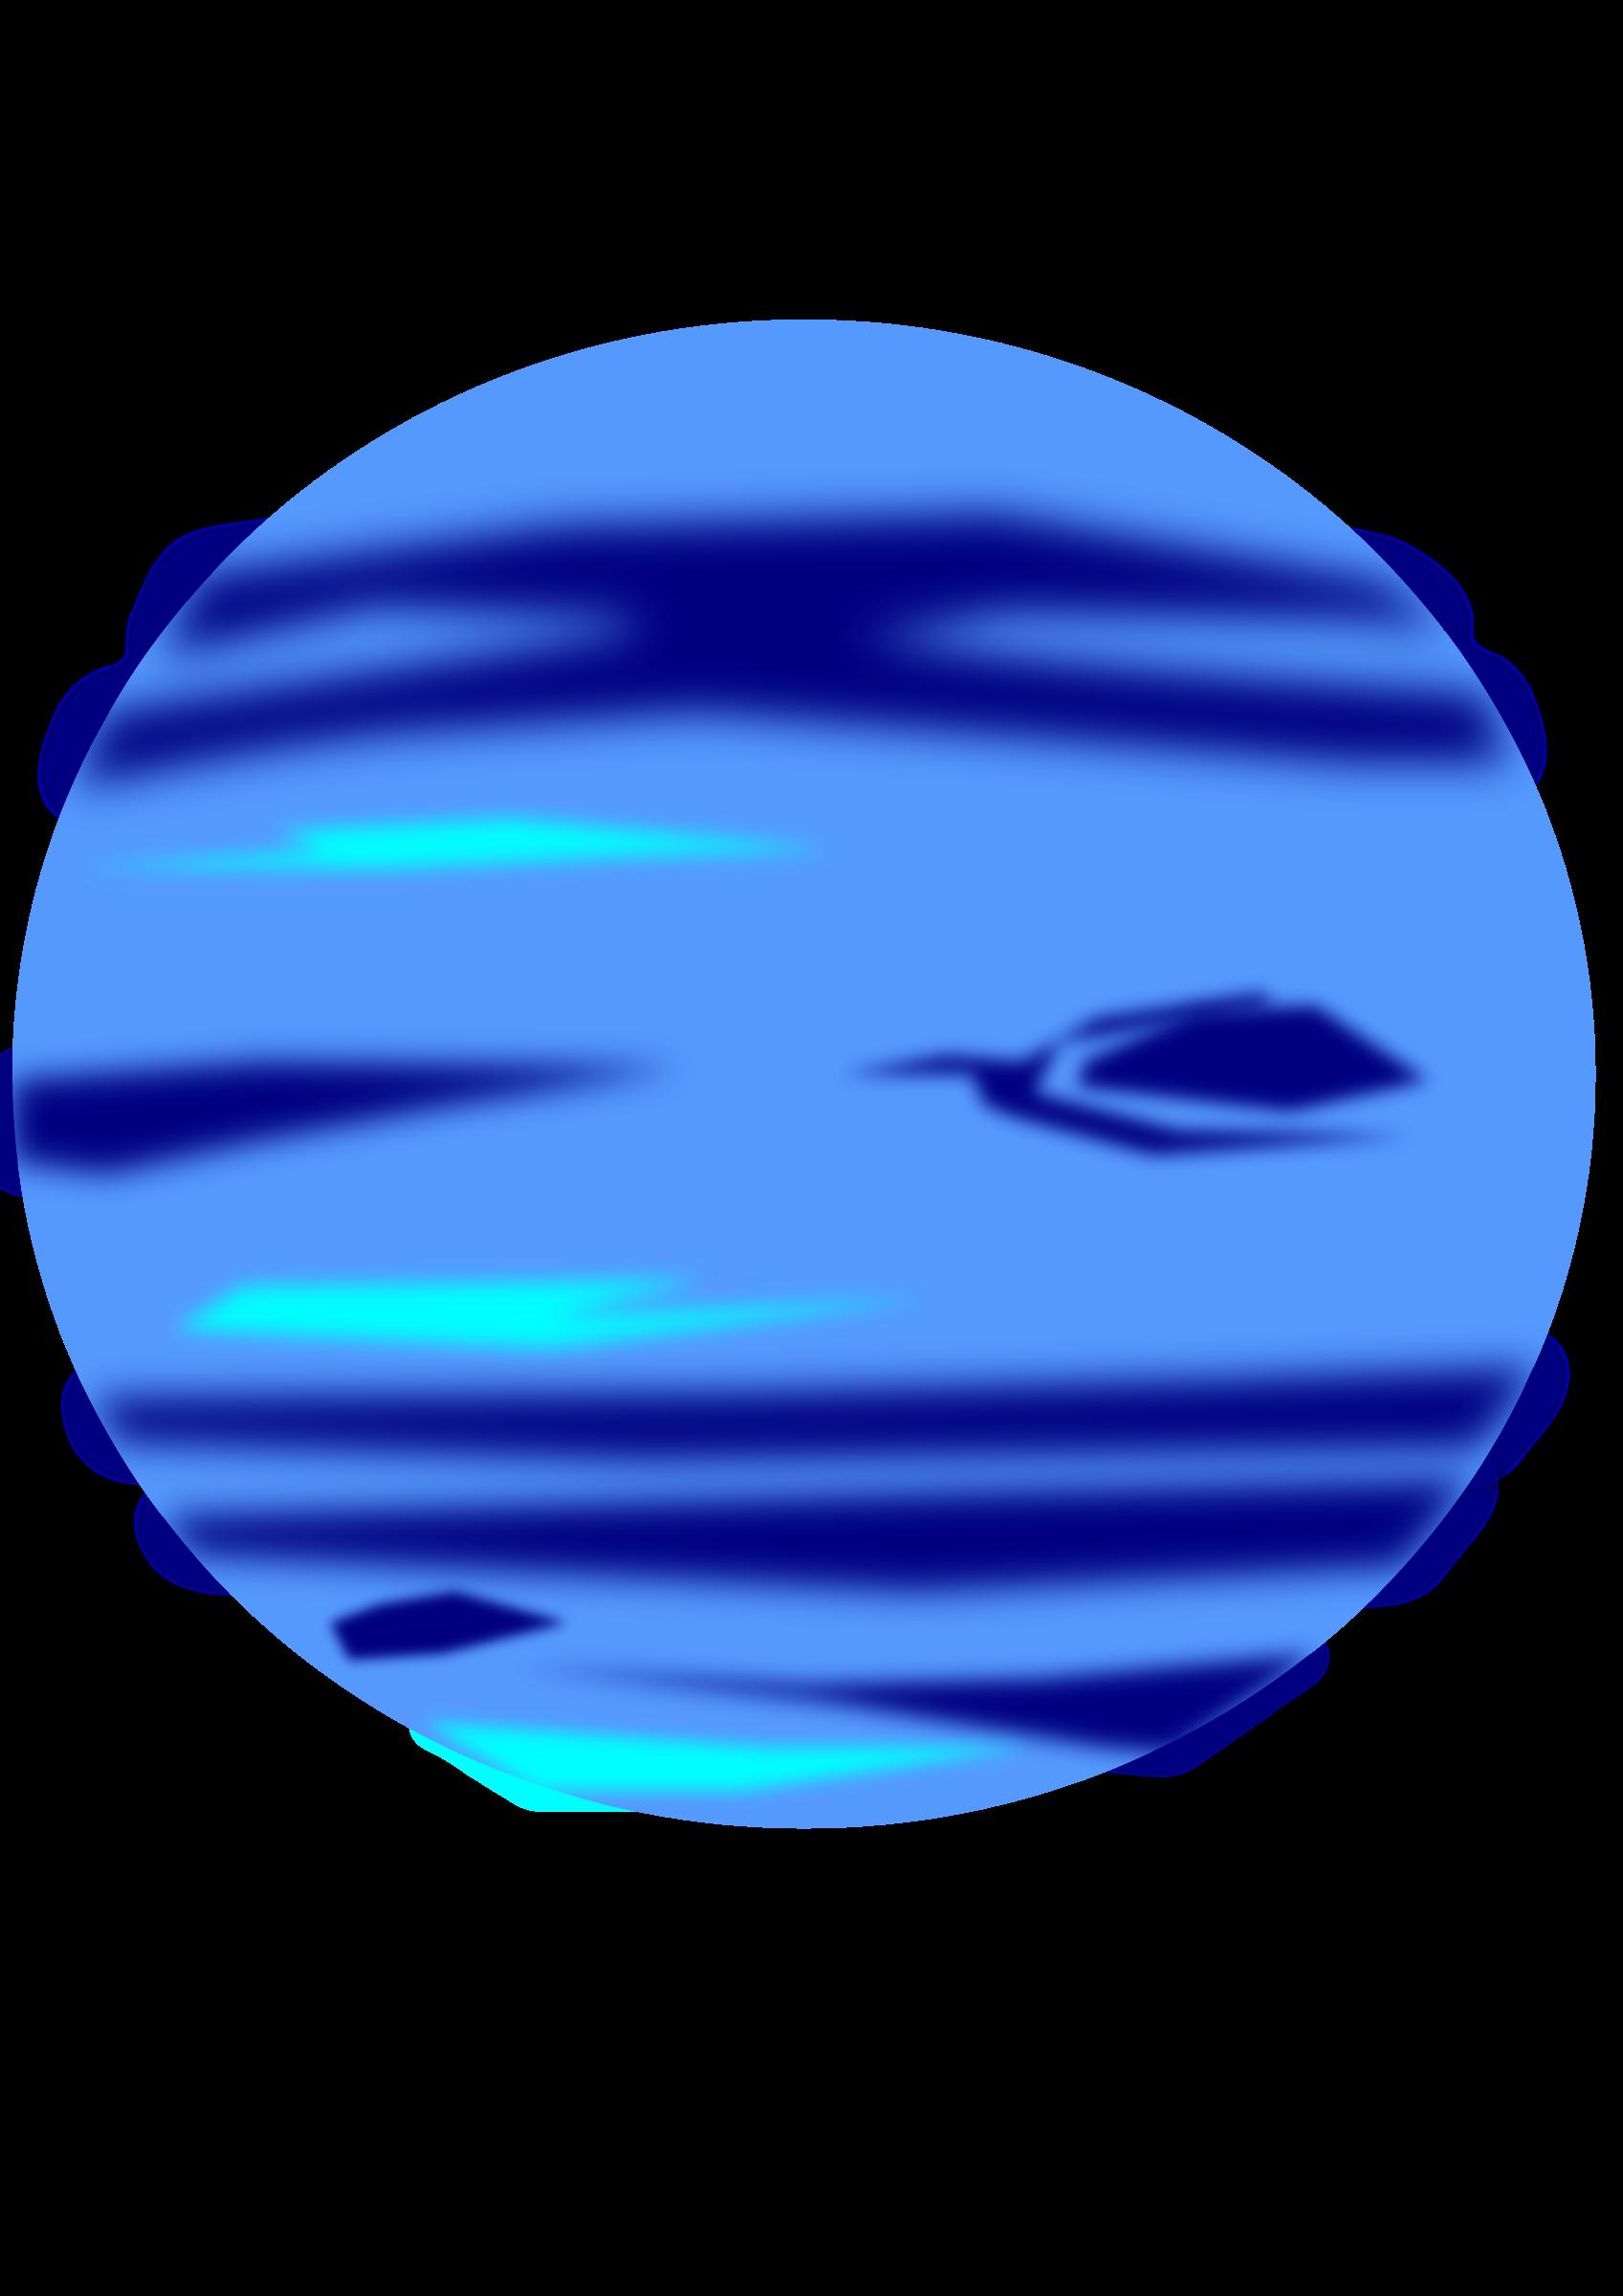 Planeten clipart uranus. My planet big image